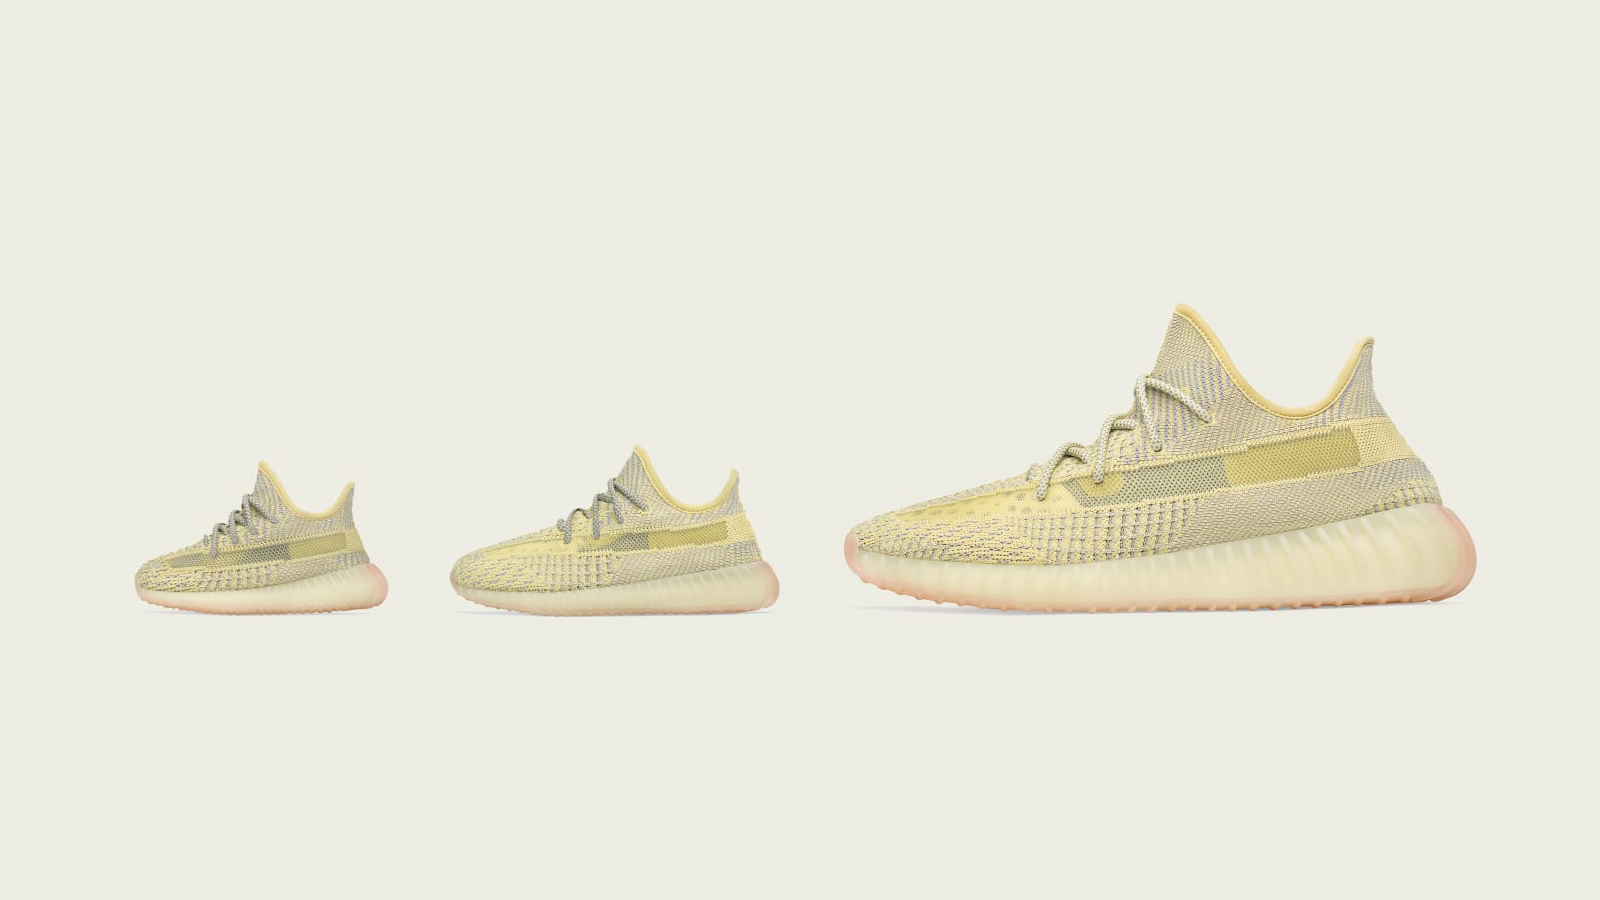 06-adidas-yeezy-boost-350-v2-antlia-non-reflective-fv3250